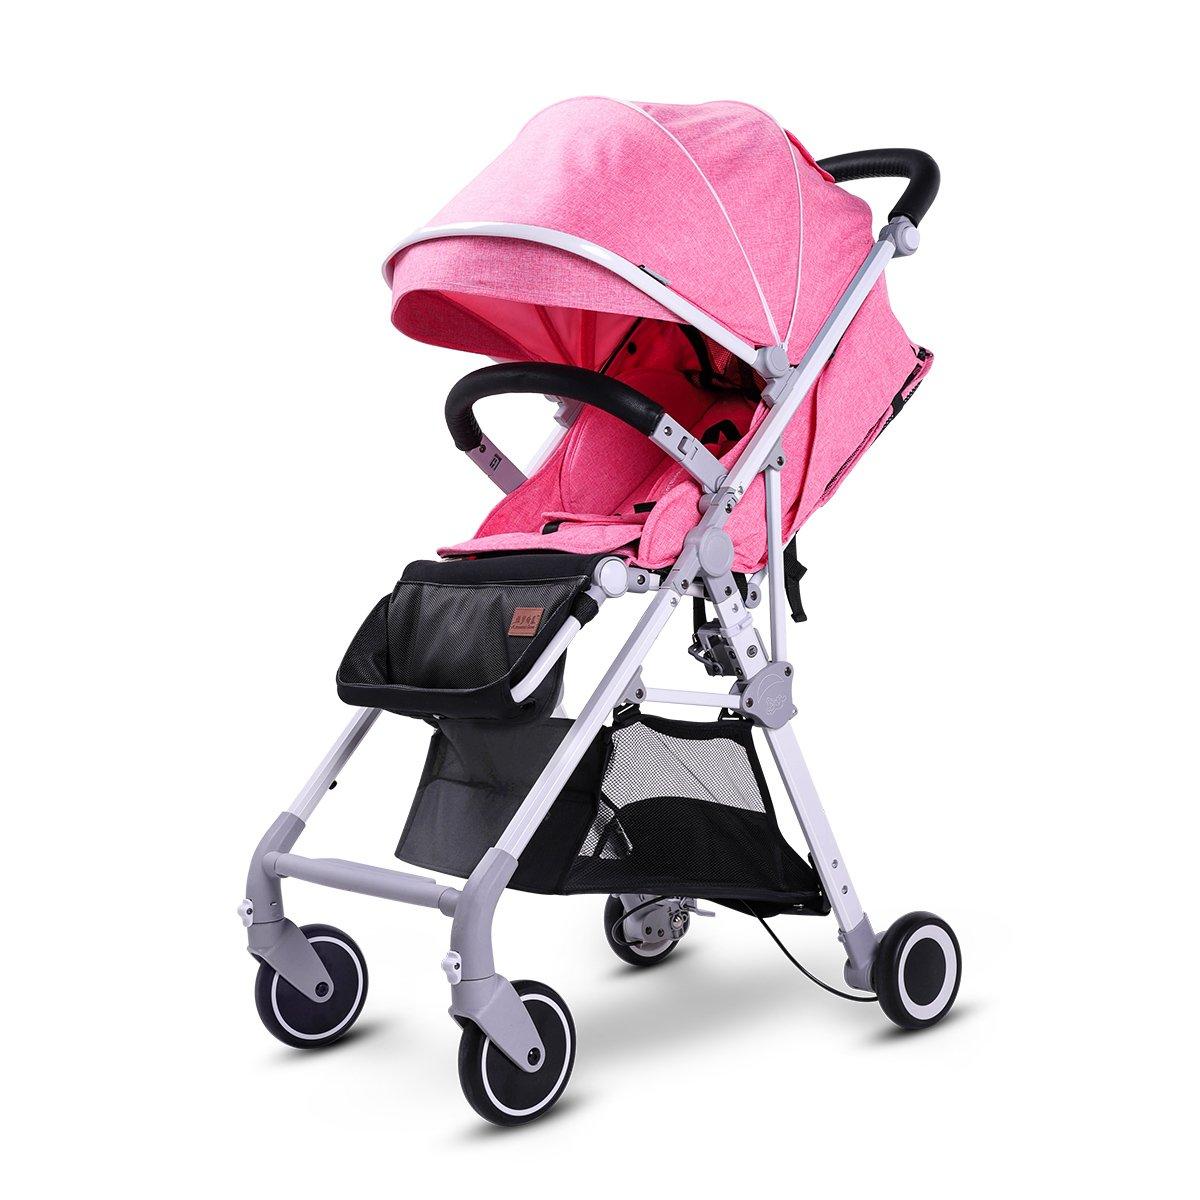 2 in 1 Baby Stroller Lightweight Stroller Adjustable Infant Pram Foldable Pushchair High View Baby Stroller With Storage Basket. (Pink)